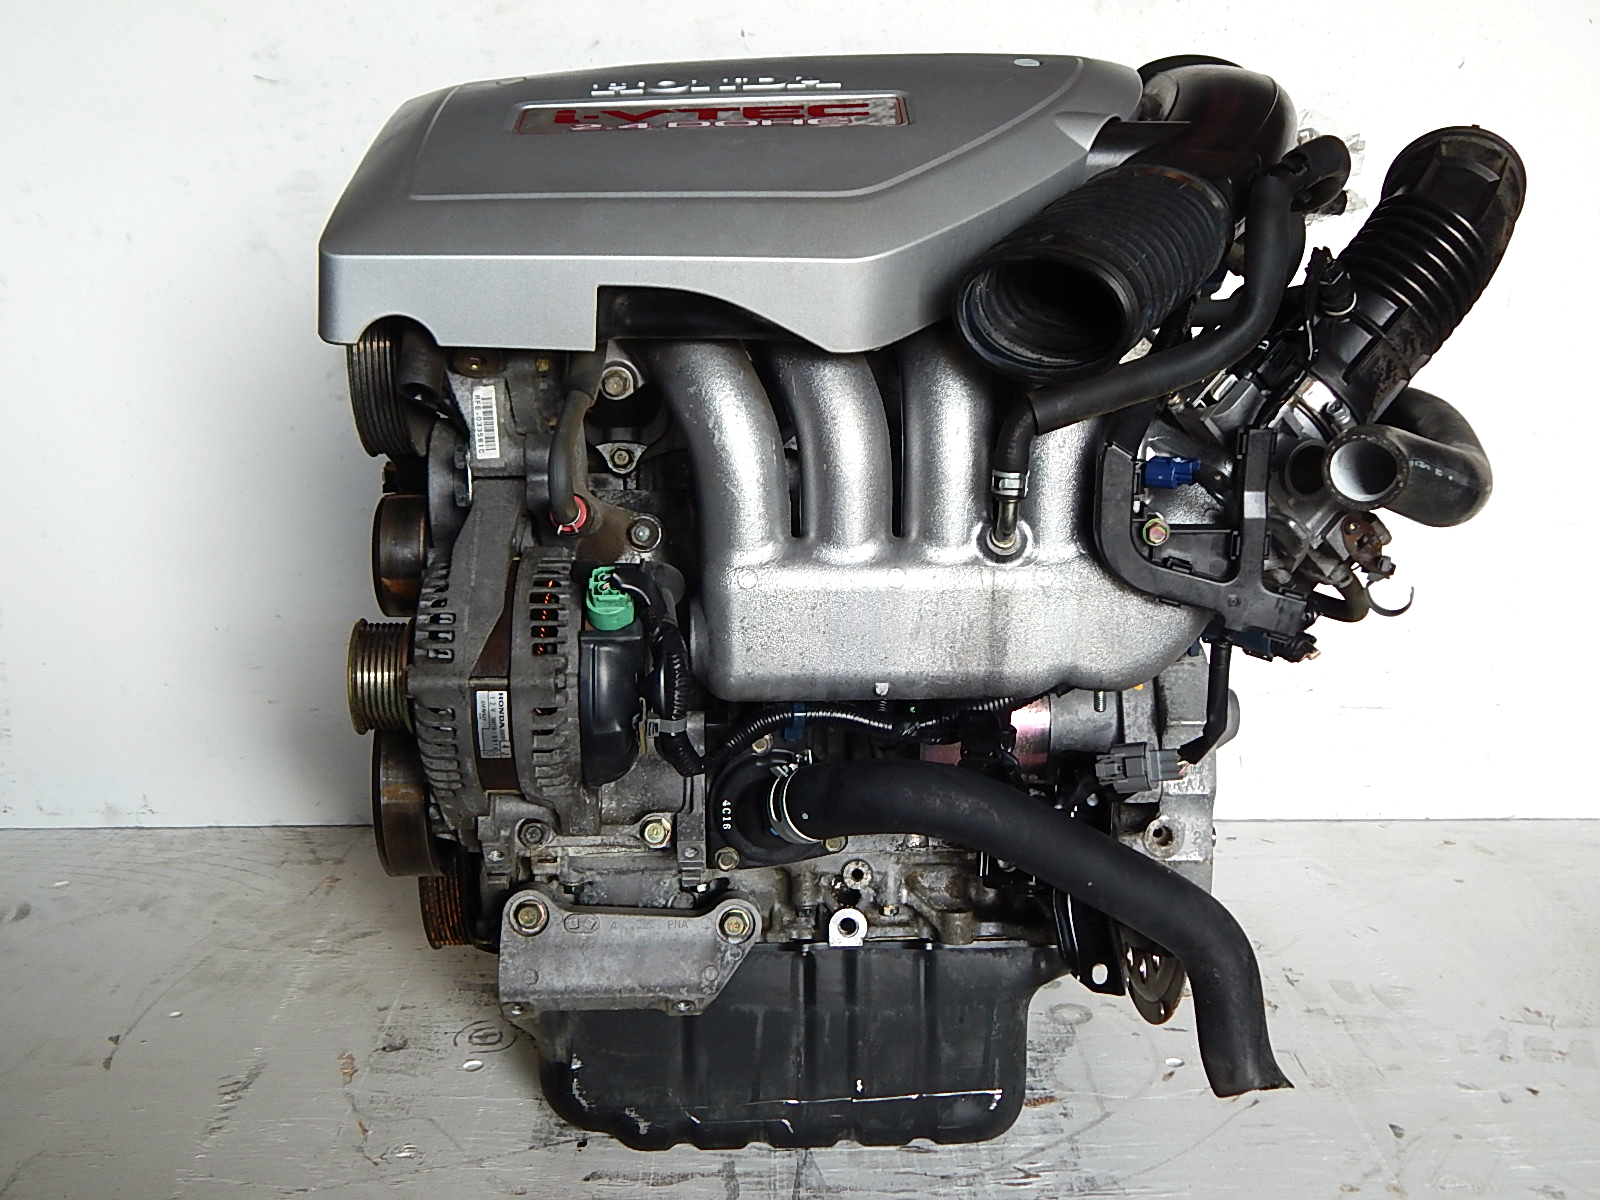 K24a 2002 2008 Jdm Acura Tsx K24 Engine Rbb Vtec Jdm Of